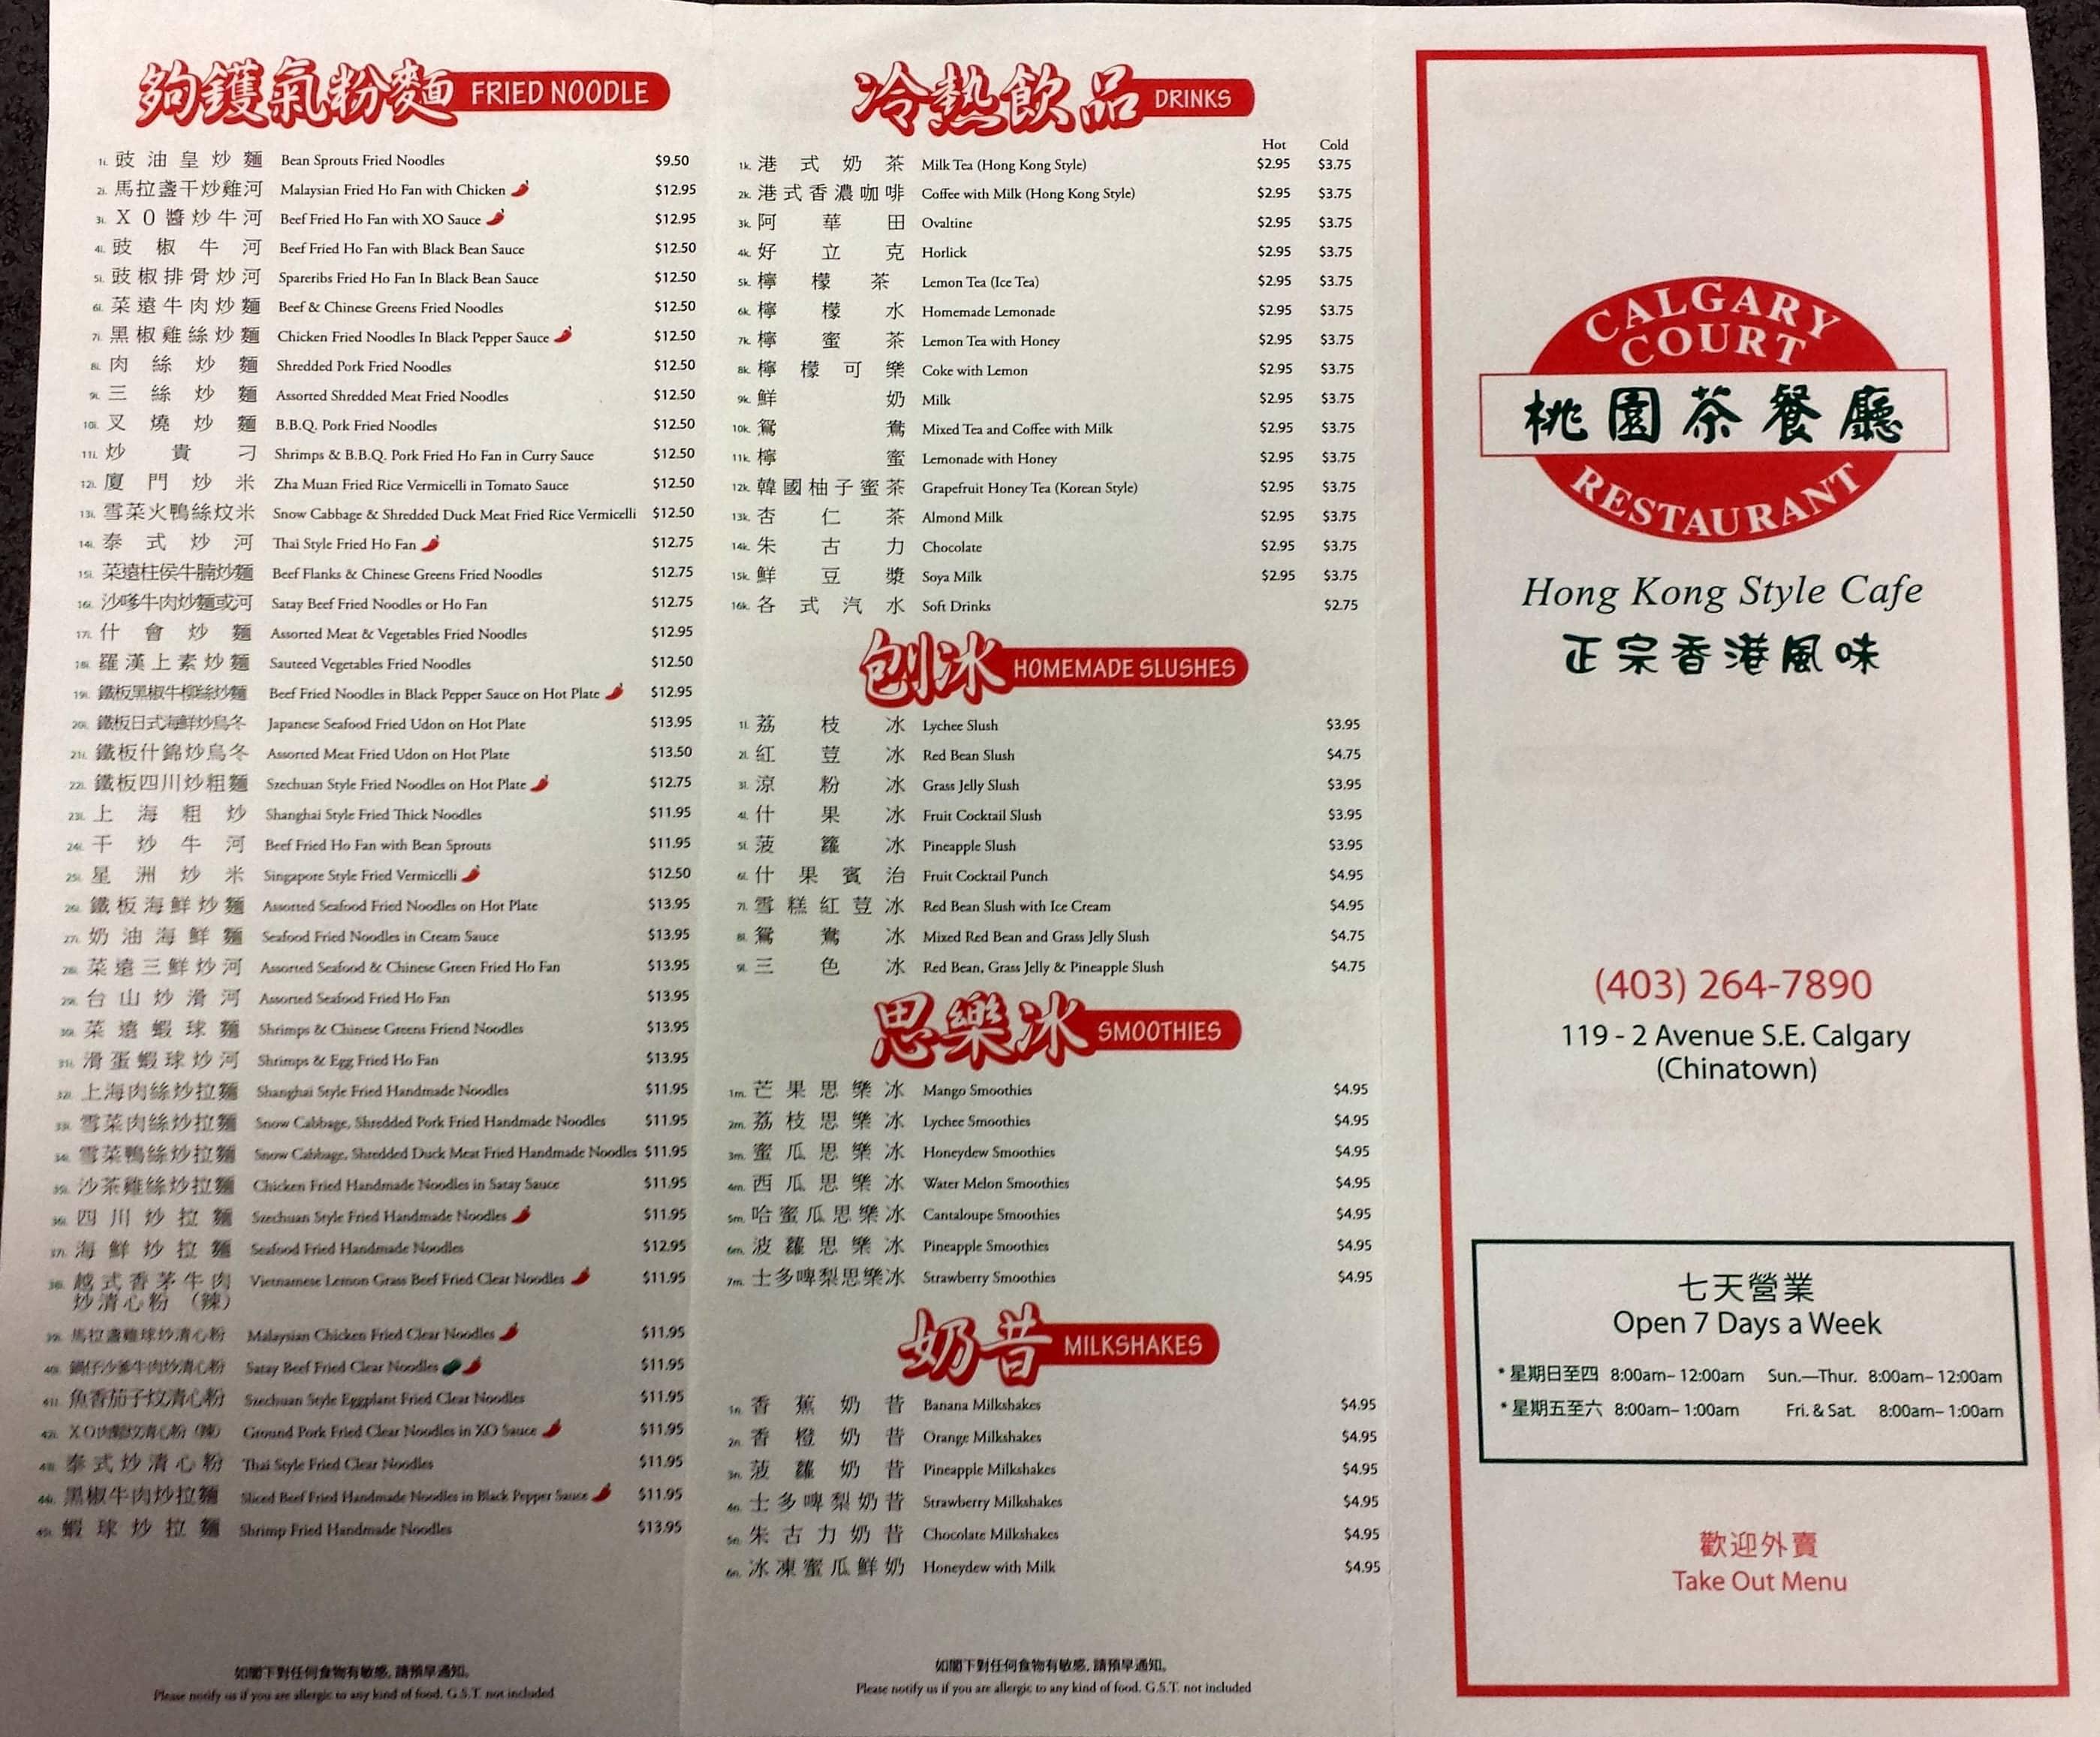 Calgary Court Restaurant Menu